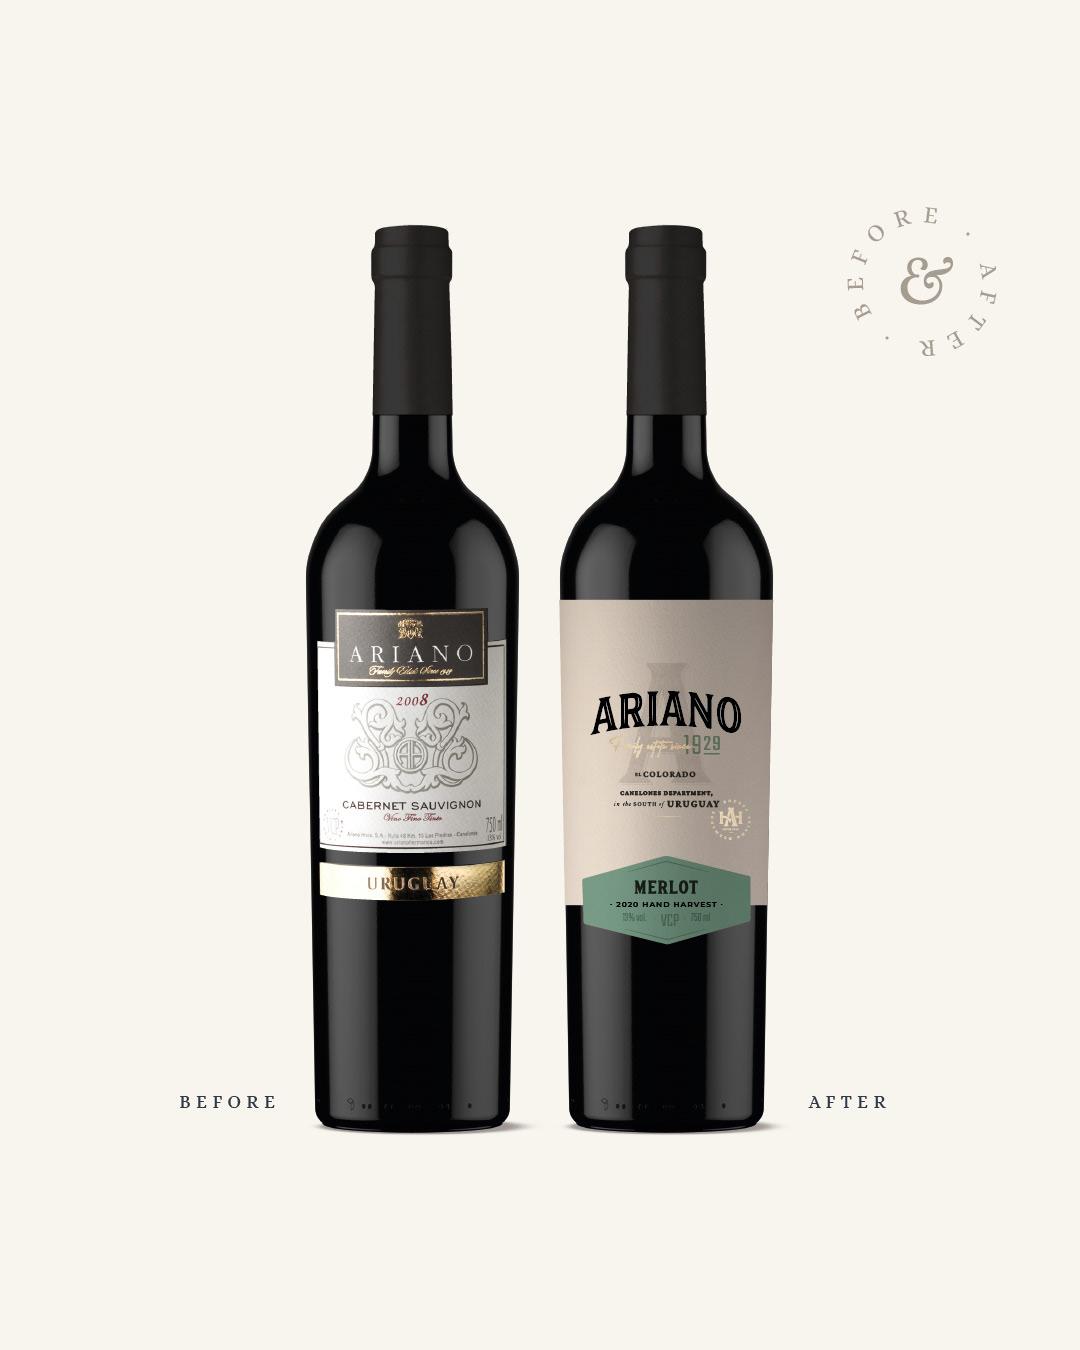 design etiqueta Label vino wine brand identity label design Logo Design product packaging Wine Bottle